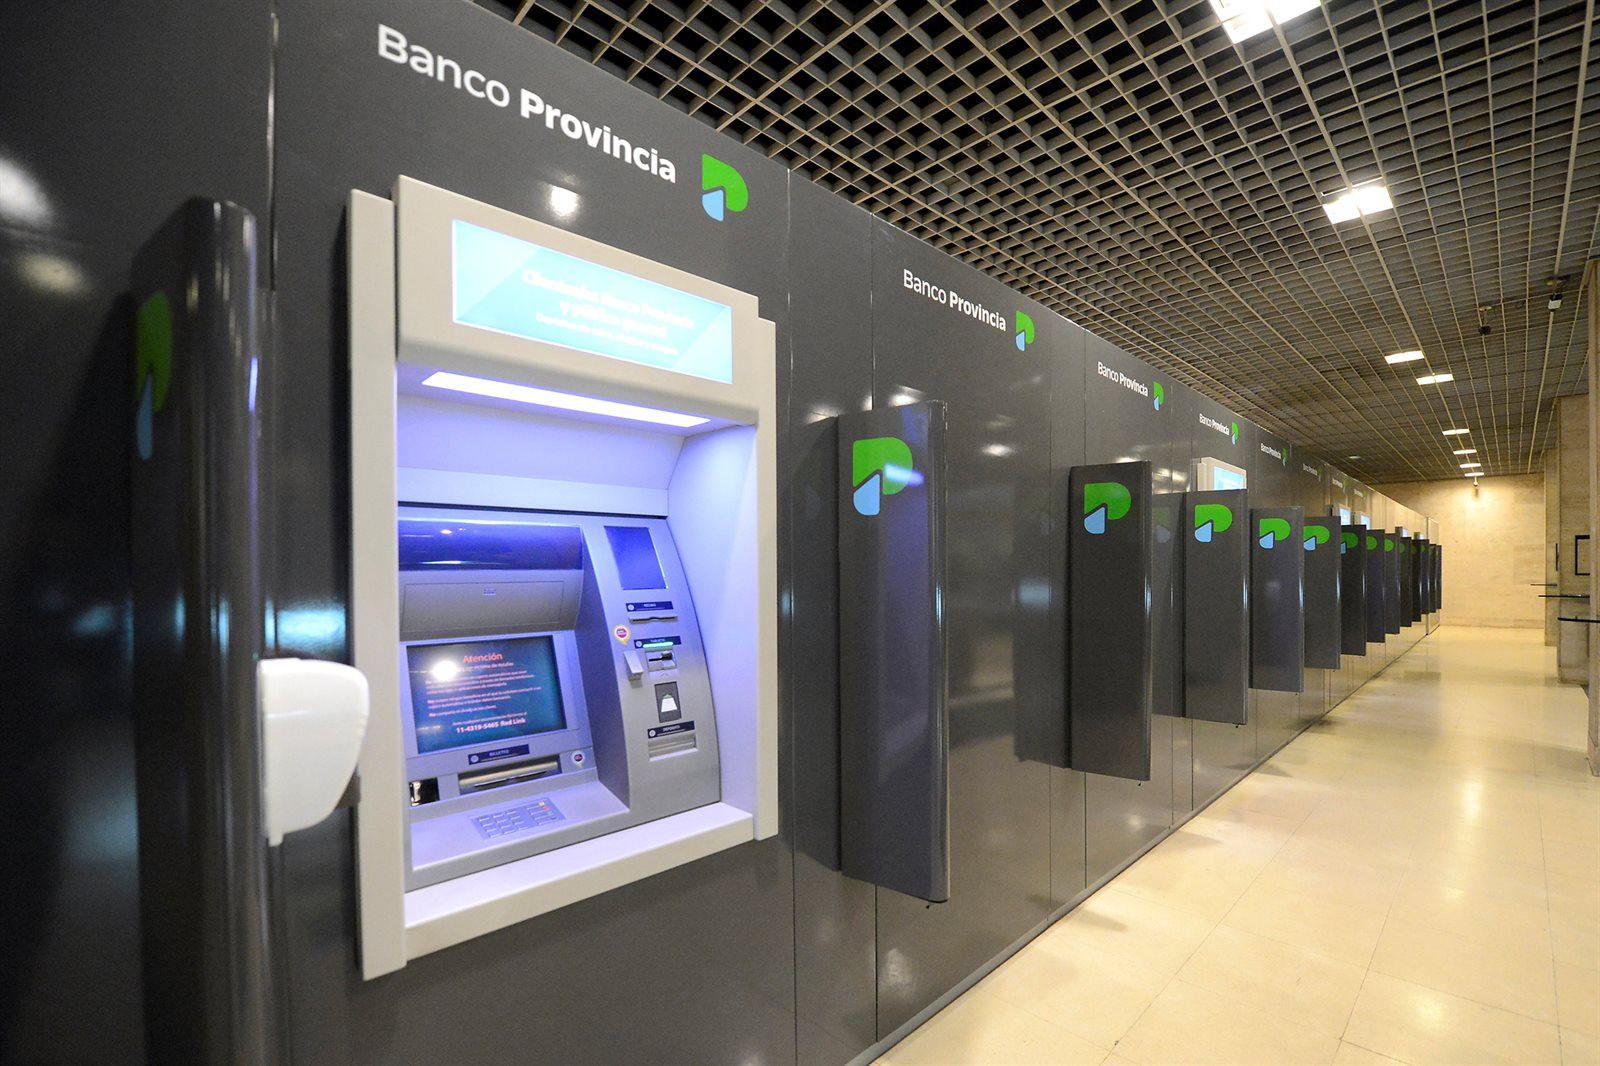 banco provincia Aca se produce